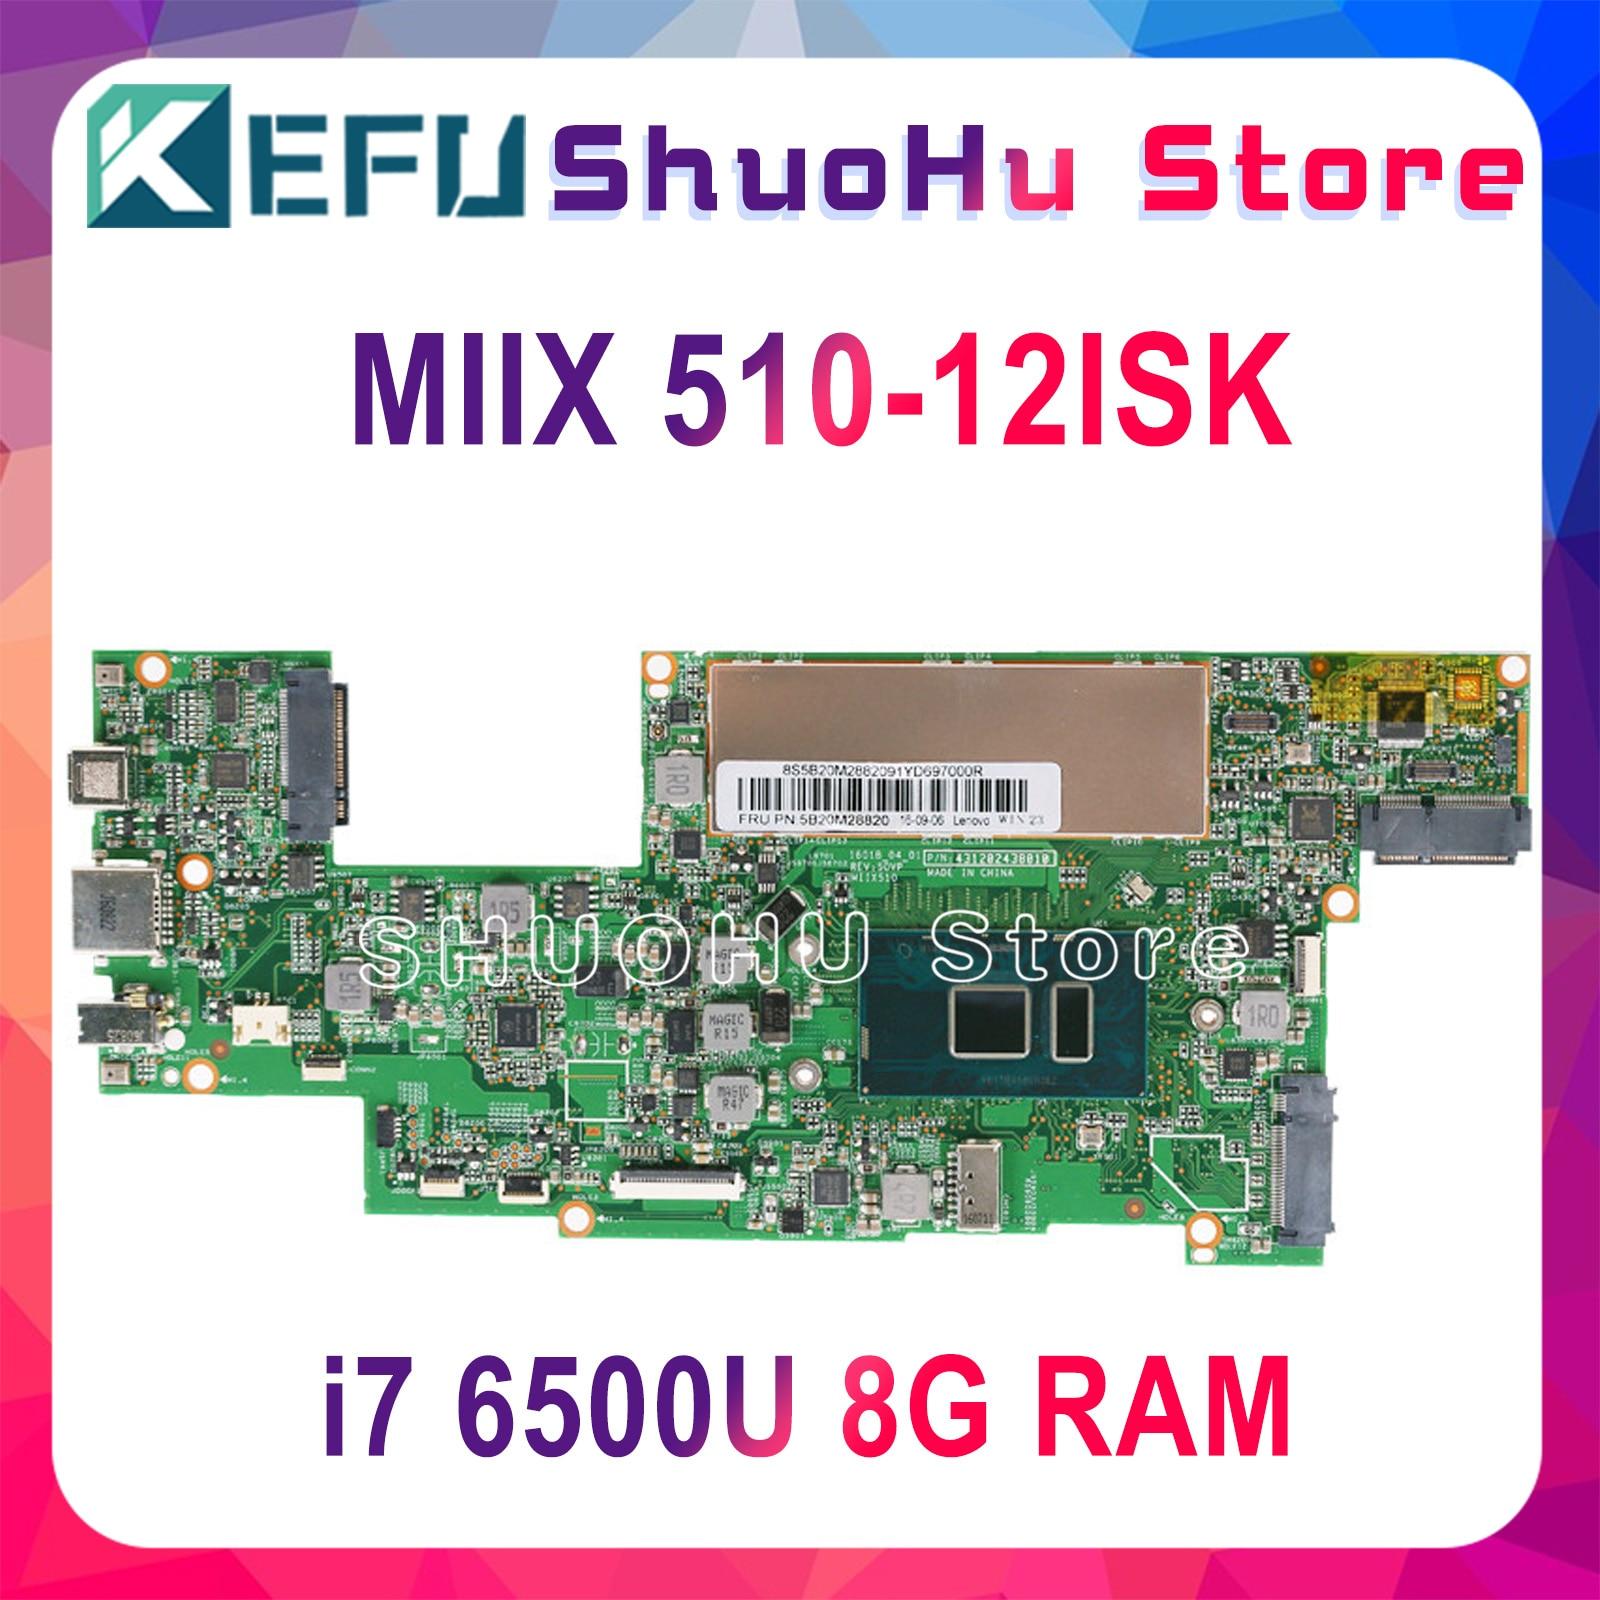 KEFU MIIX510 اللوحة لينوفو MIIX510-12ISK MIIX 510-12ISK دفتر اللوحة CPU i7 6500U 8 جرام RAM اختبار العمل الأصلي